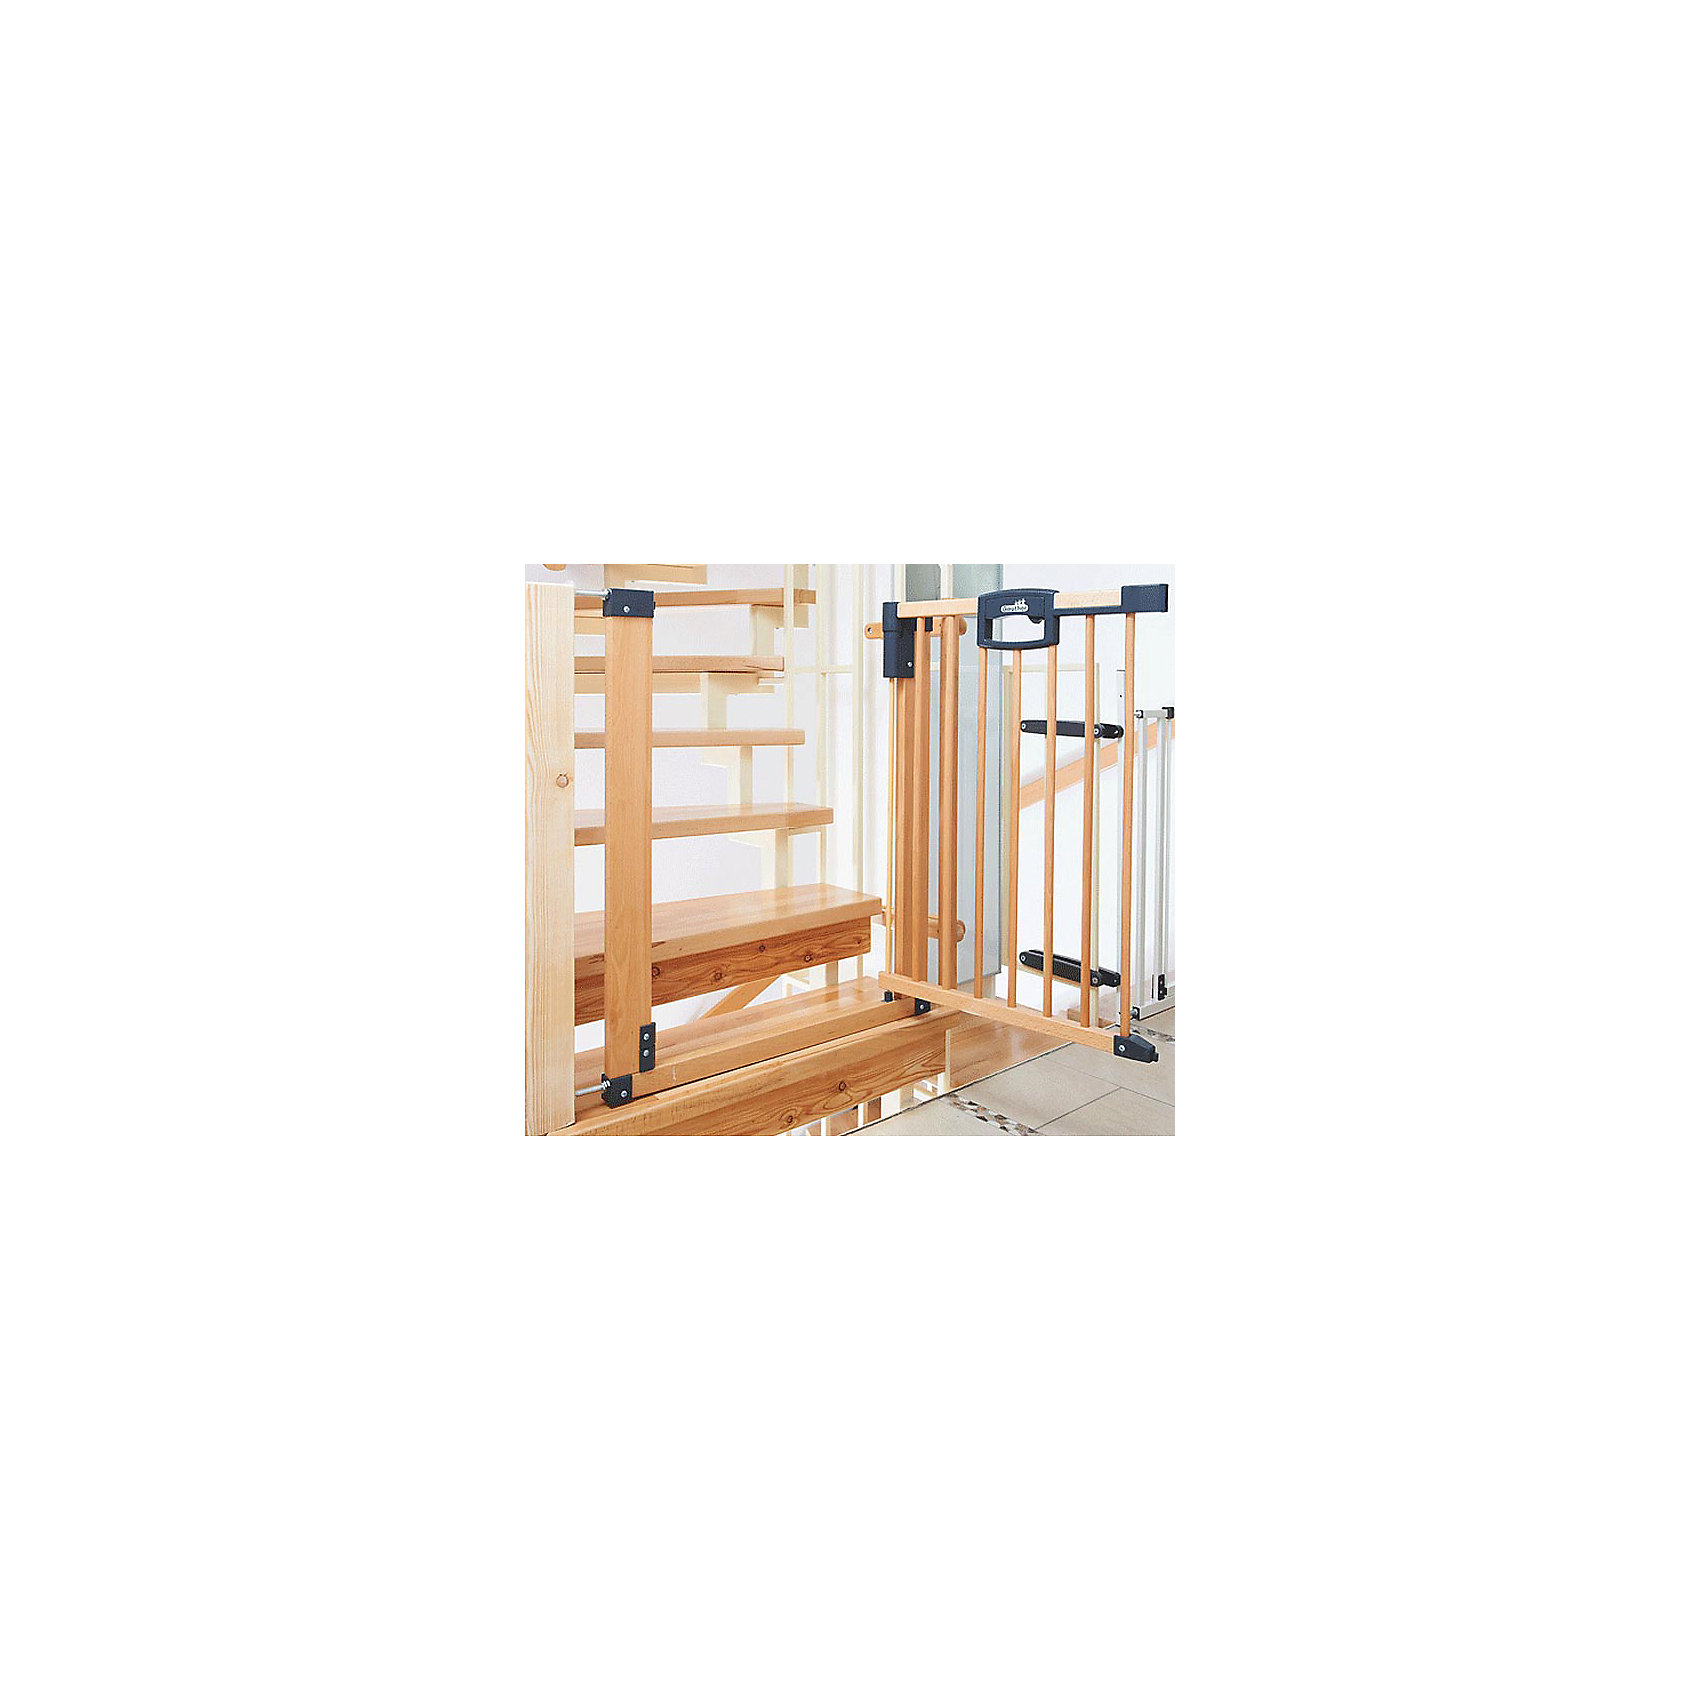 Барьеры-ворота Easy Lock Natural 80,5*88,5*82,5см, Geuther